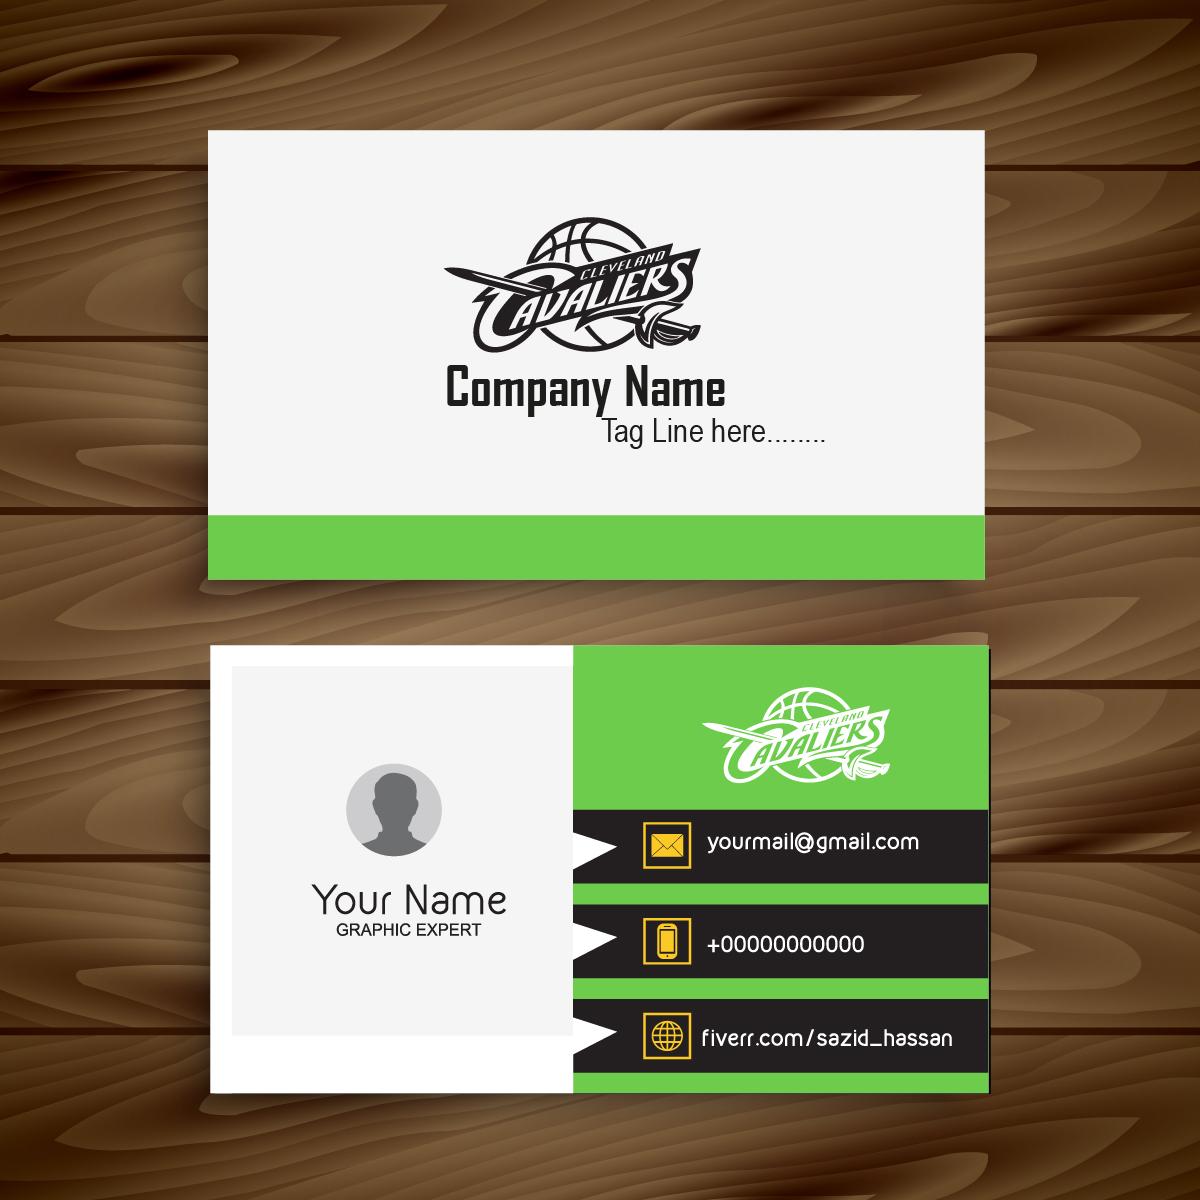 Design stylish business card,stationery,letterhead by Sazid_hassan